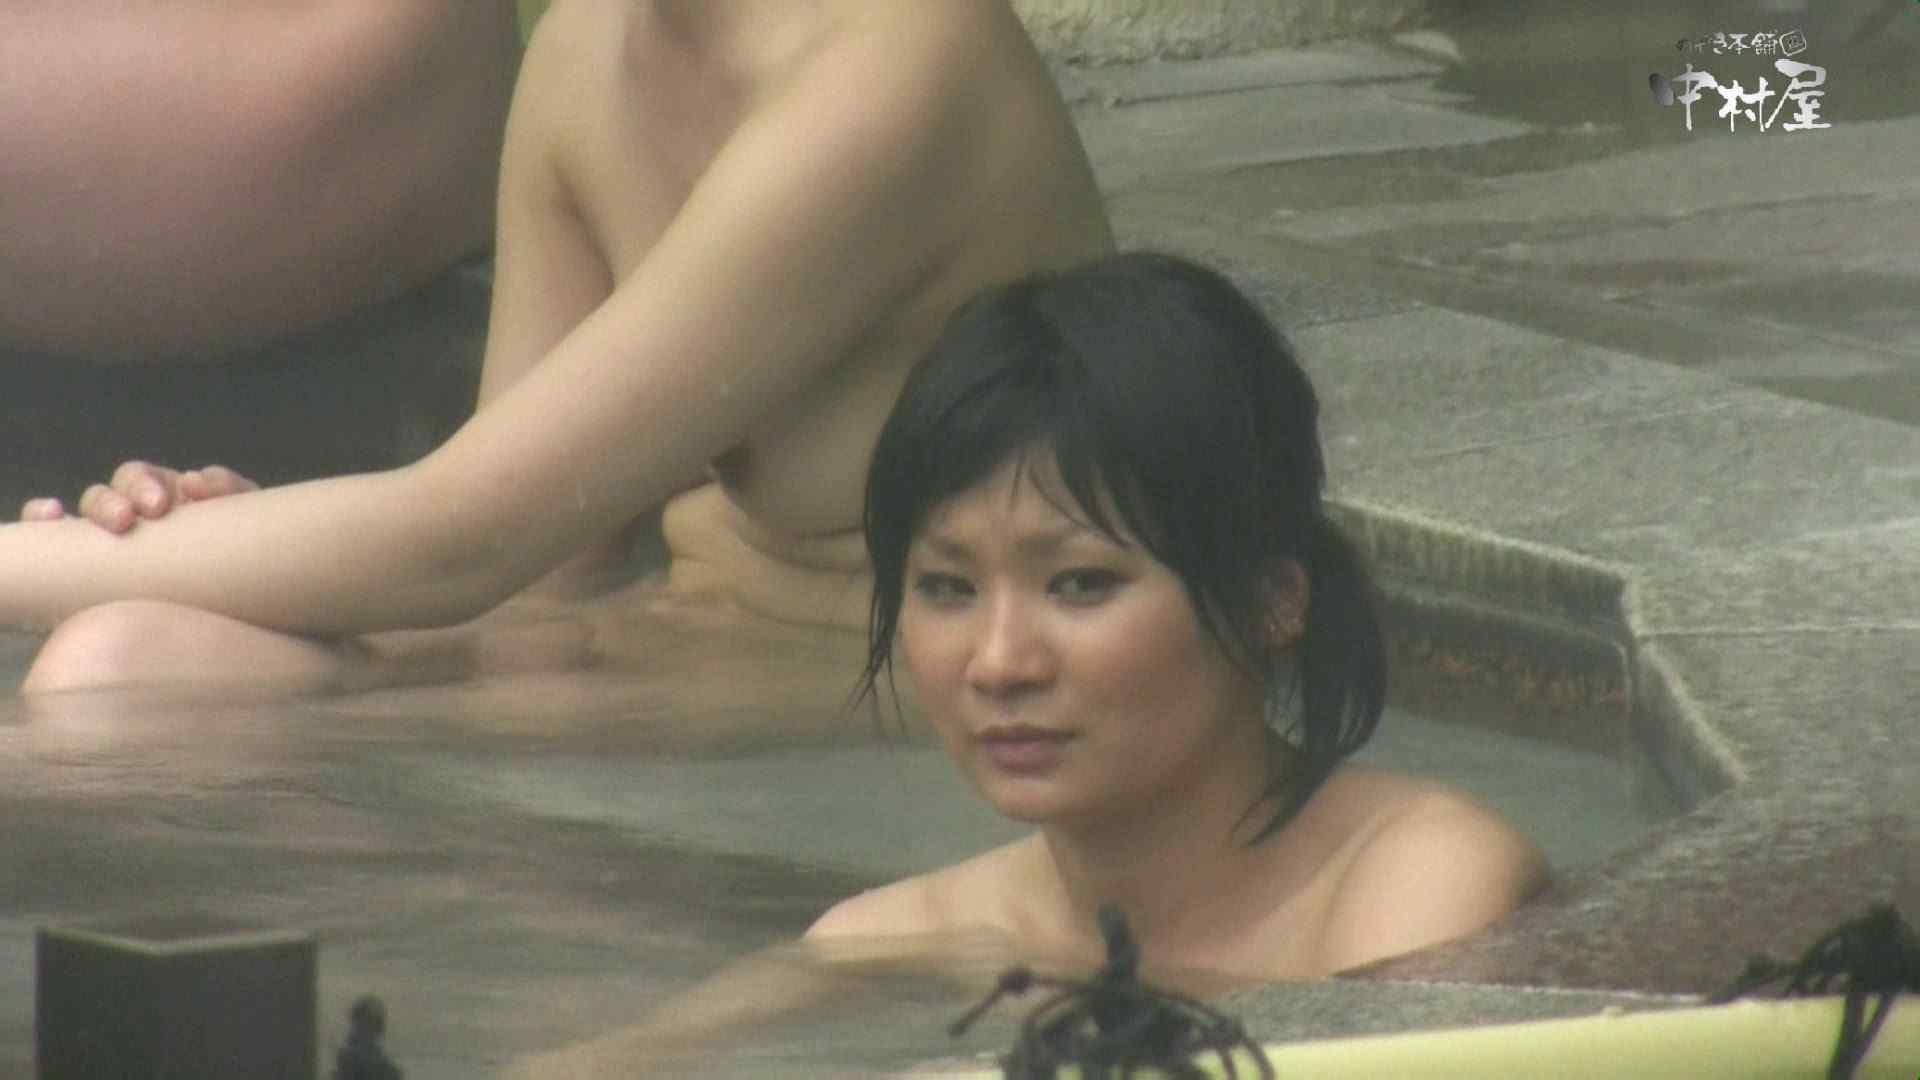 Aquaな露天風呂Vol.890 0  85連発 8